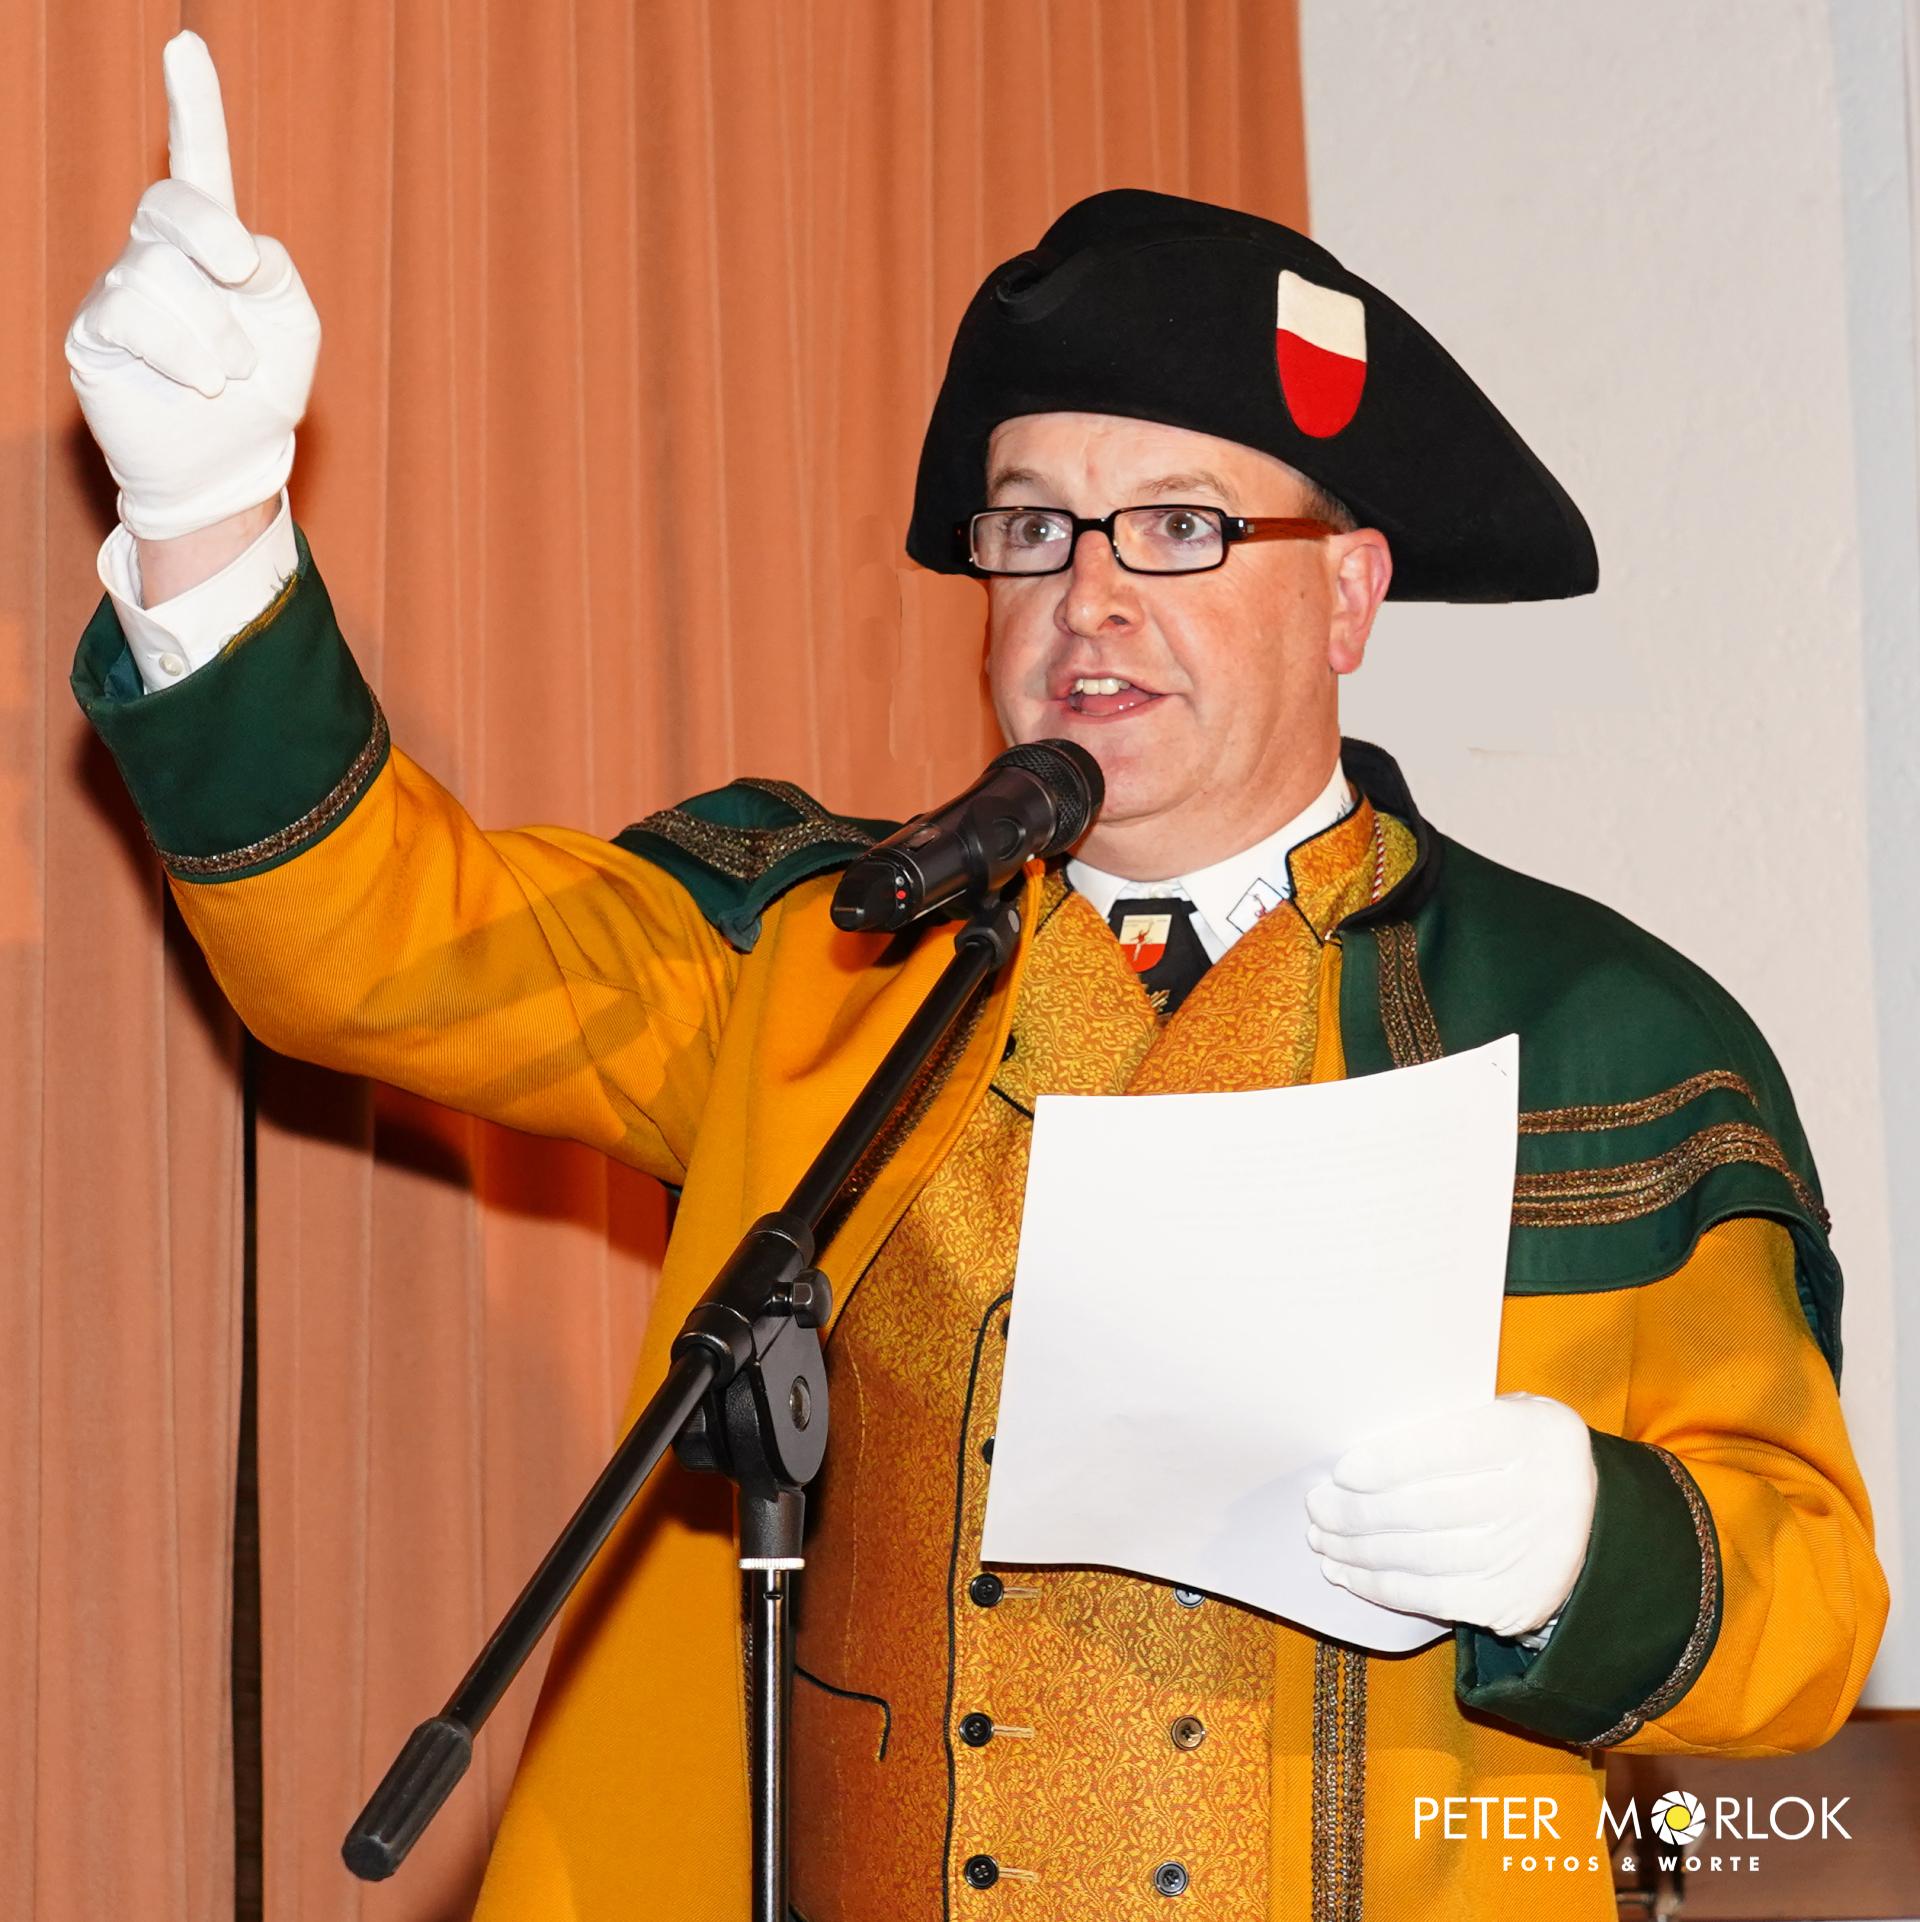 Daniel Wagner tritt zum ersten Mal als Hofmarschall vor die Horber Narrenschar - 2